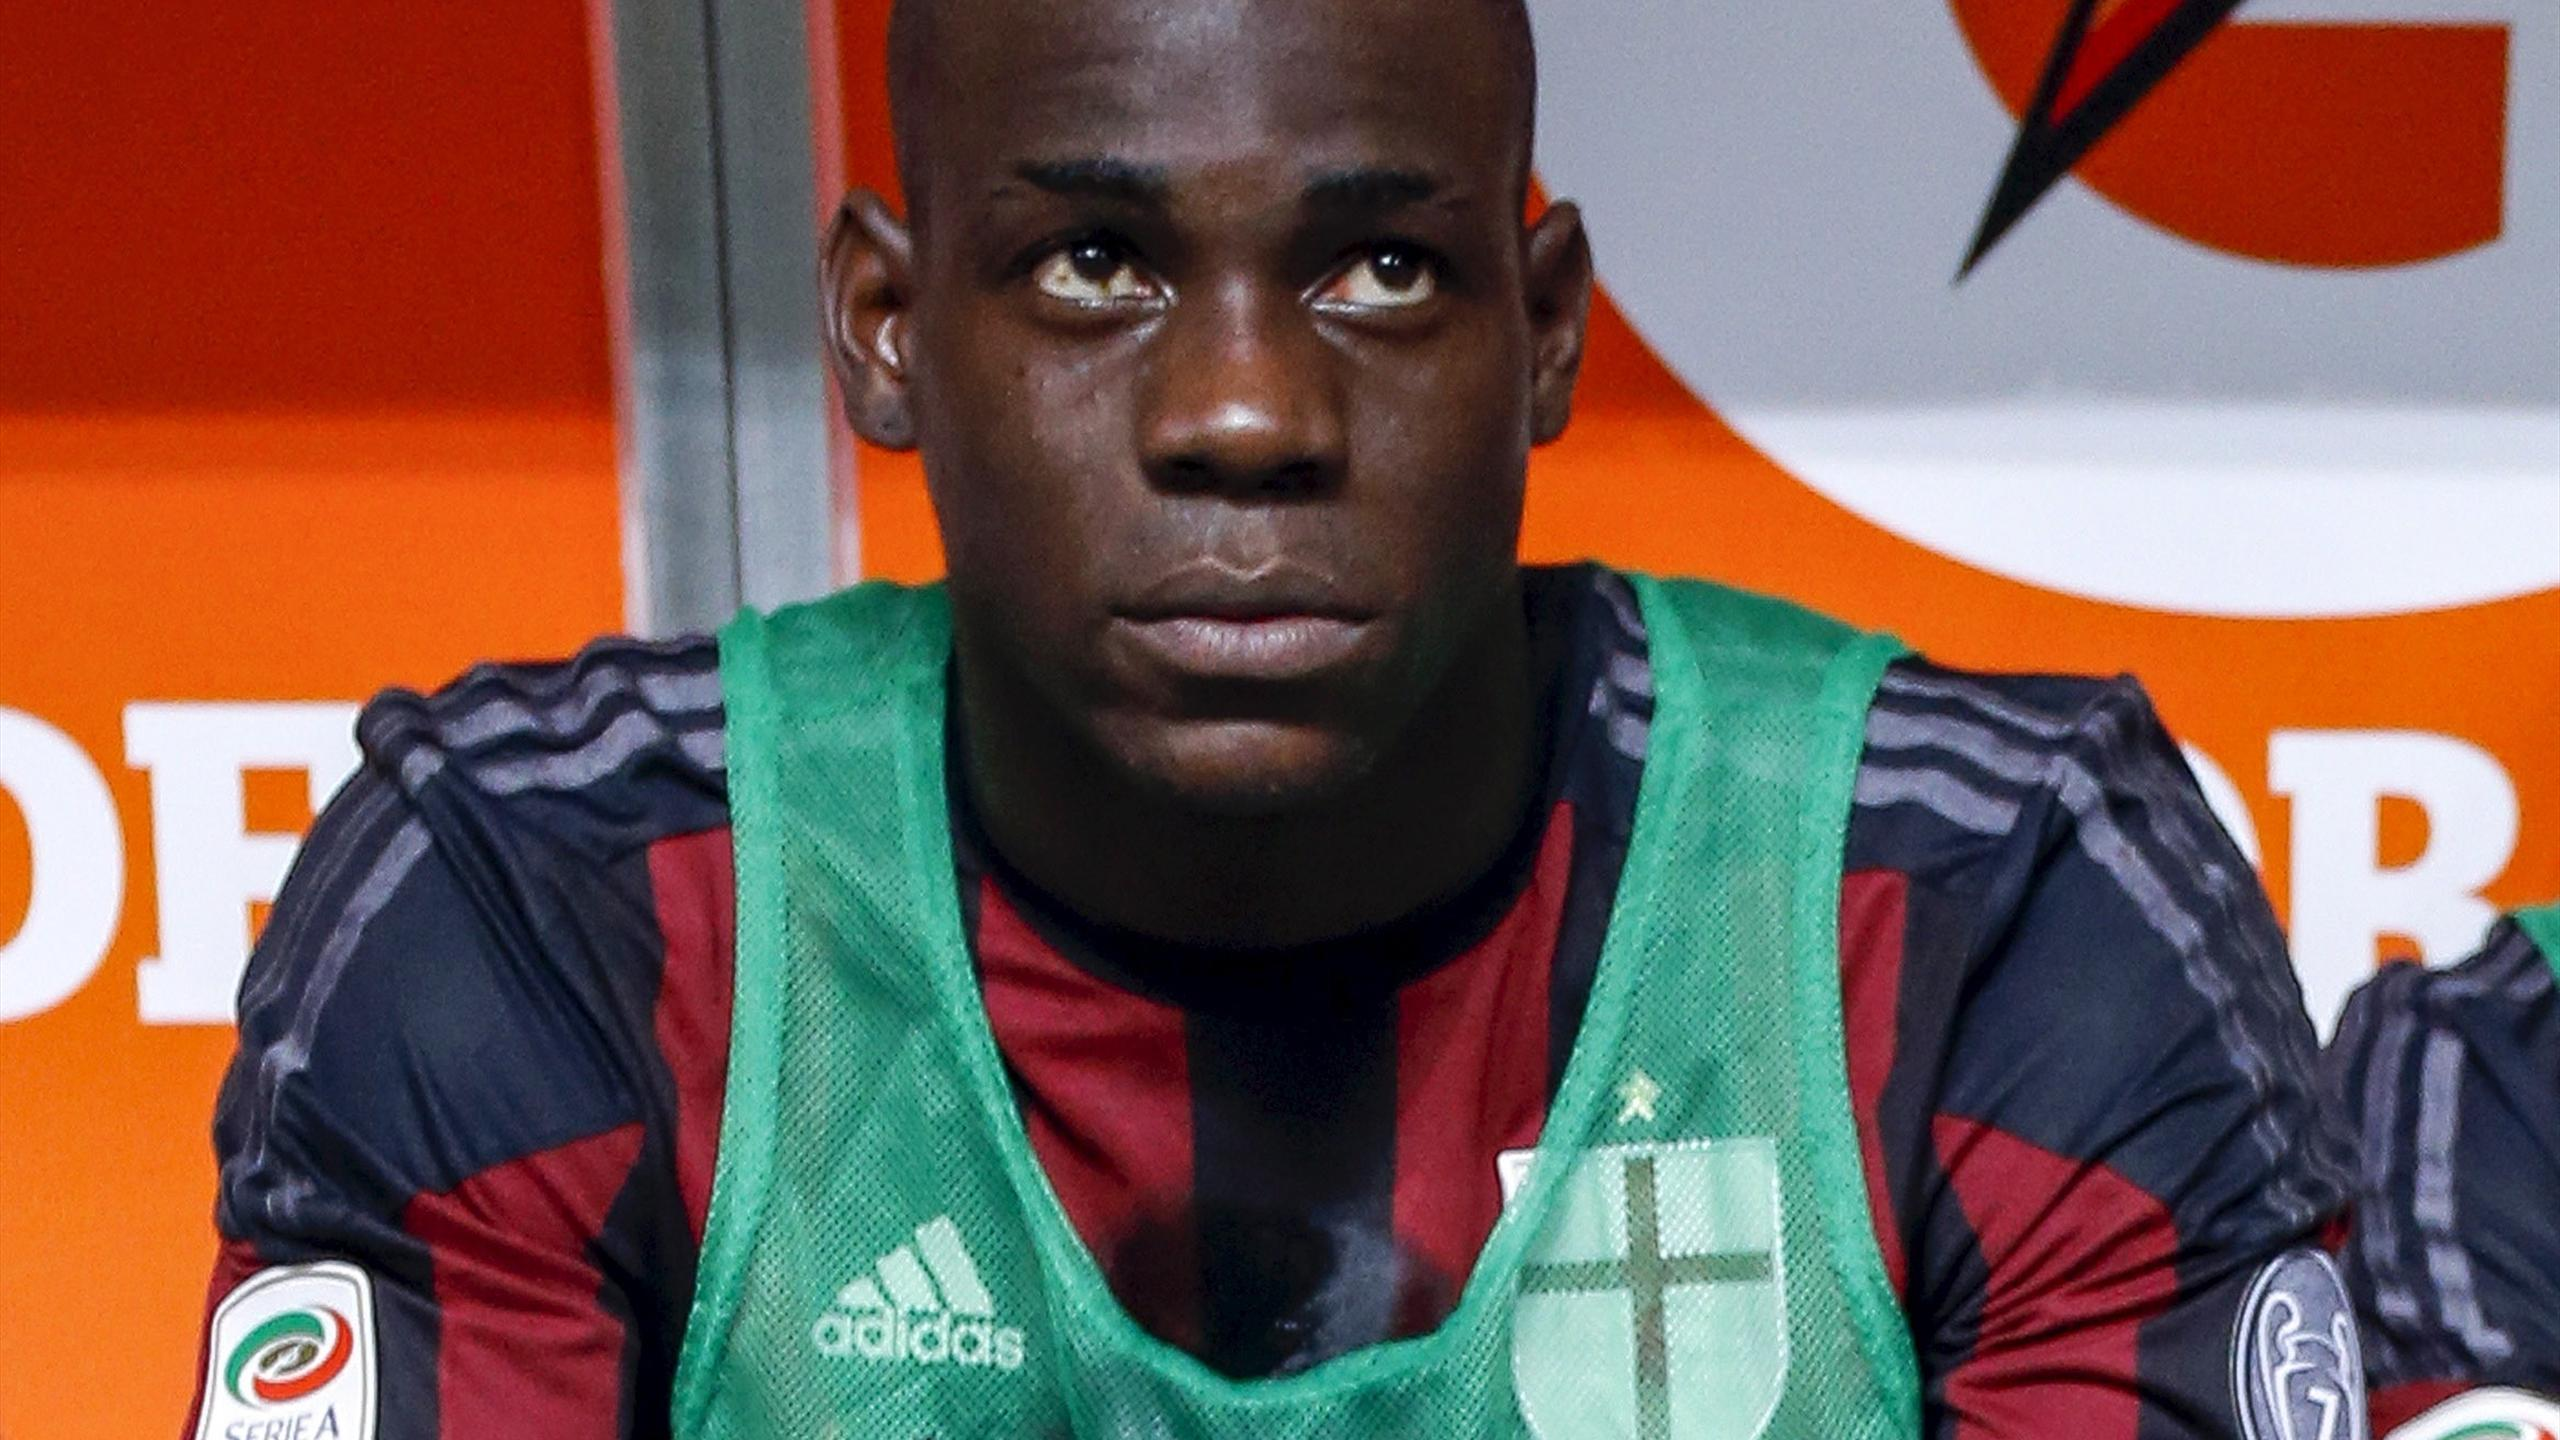 AC Milan's Mario Balotelli sits on the bench